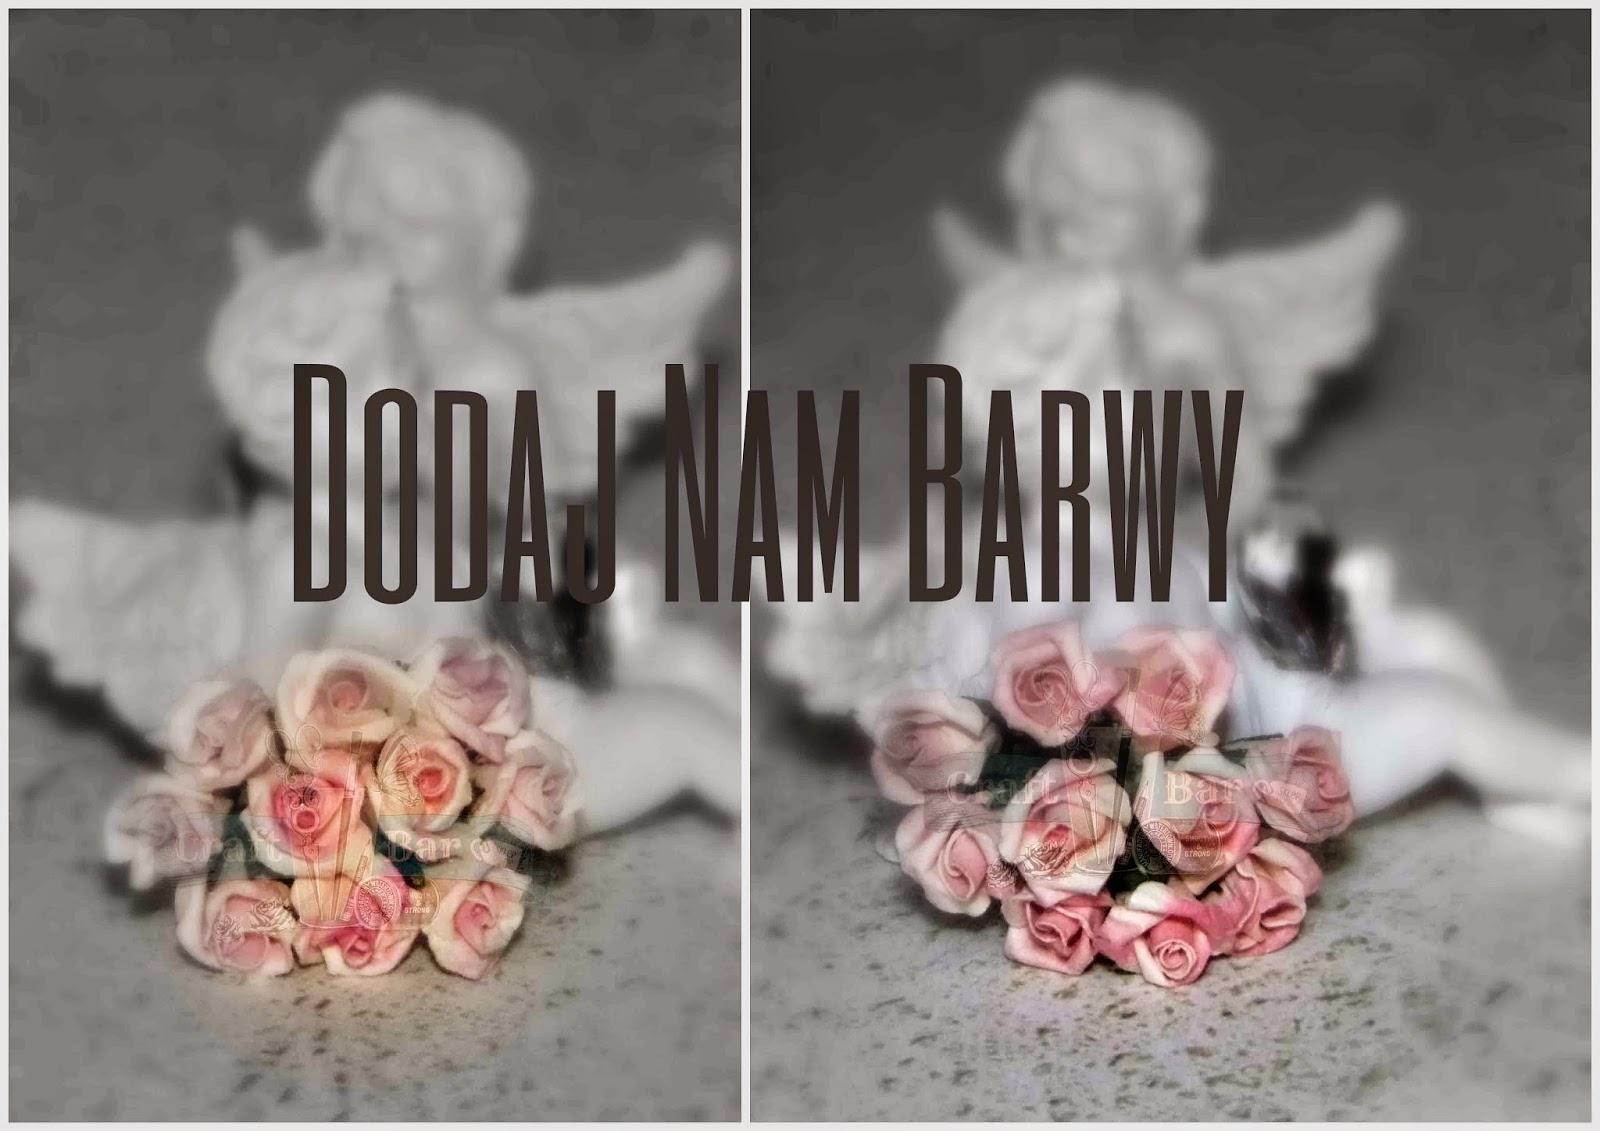 http://blog.craftbar.com.pl/2014/11/konkurs-pt-dodaj-nam-barwy.html